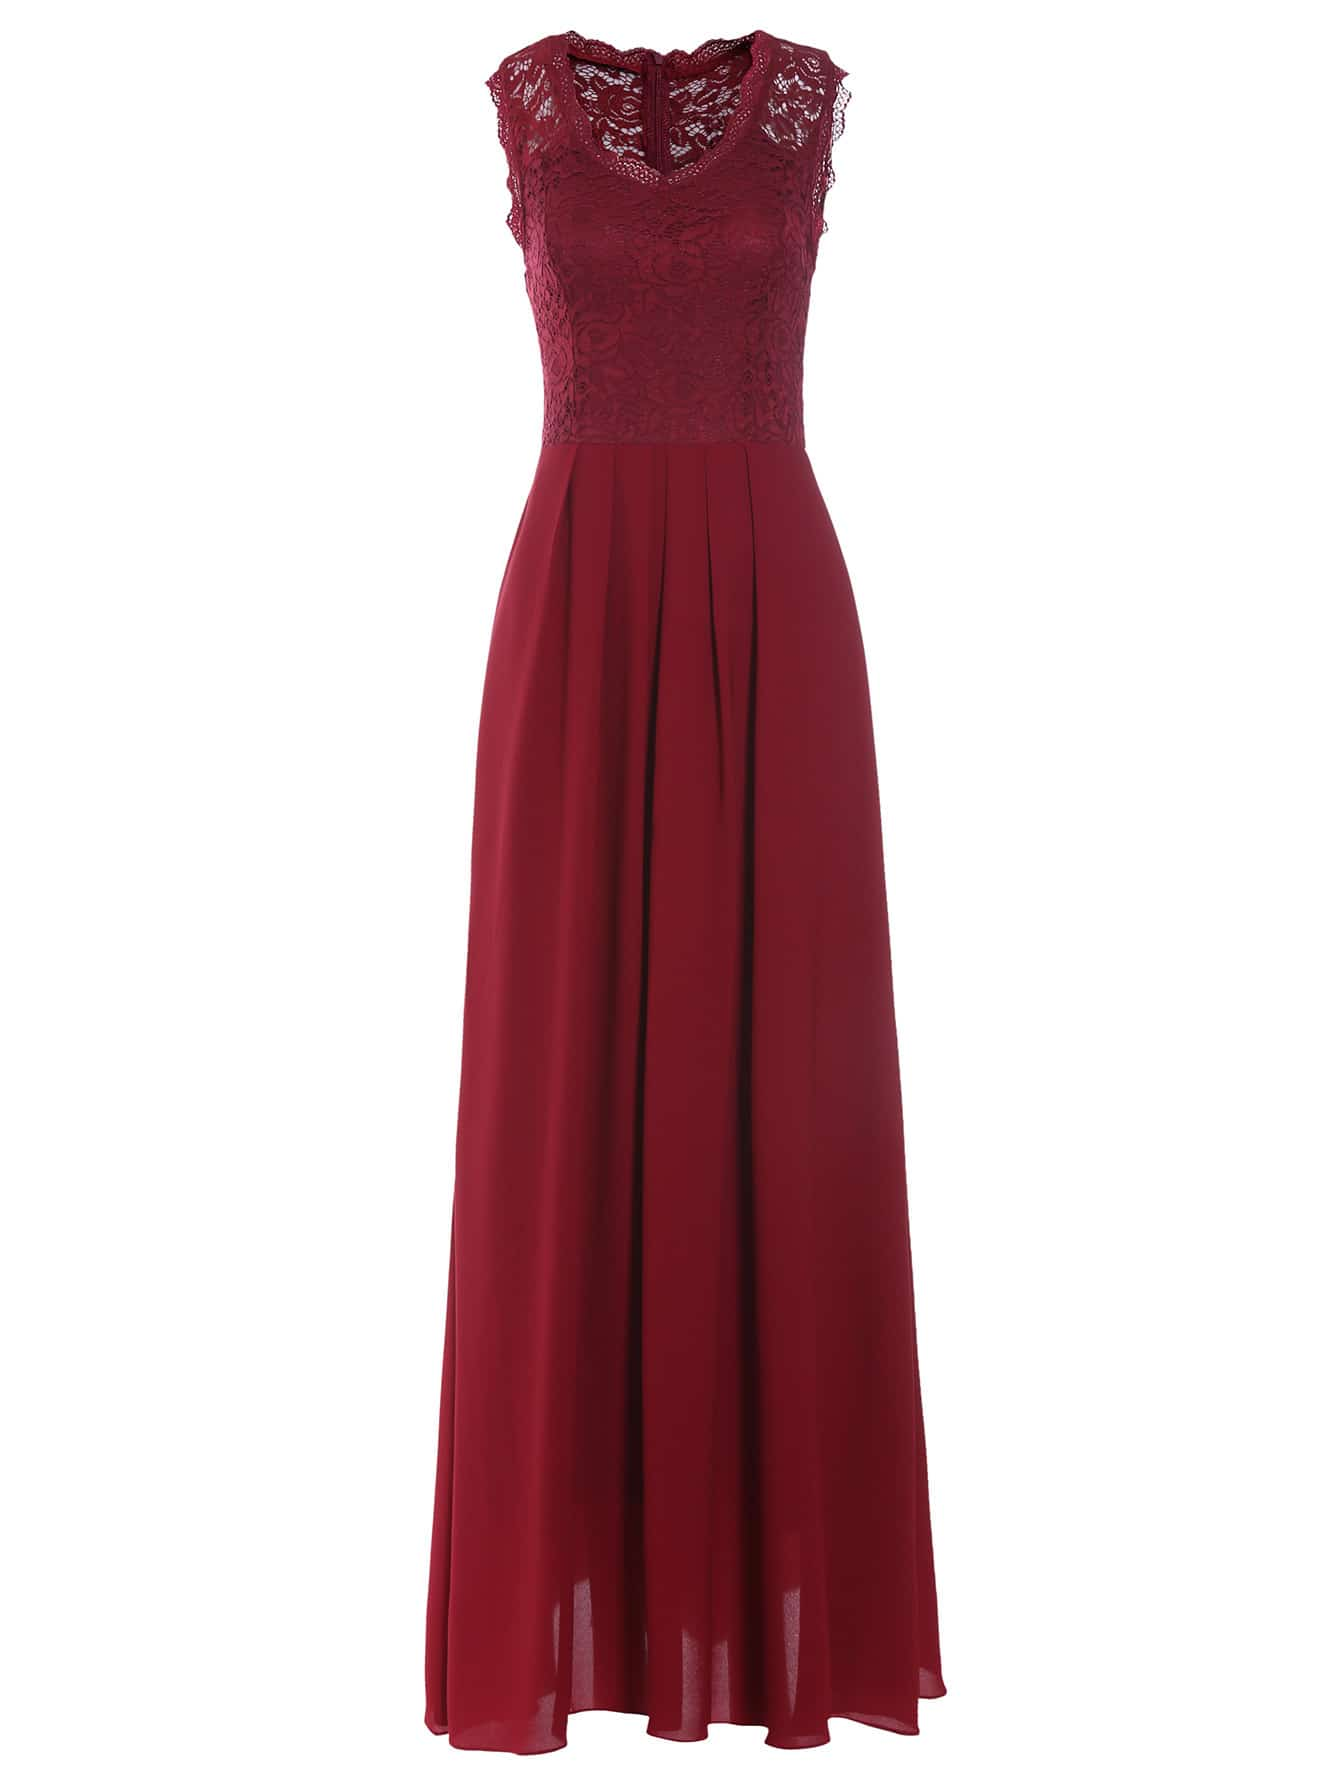 Burgundy Lace Overlay Maxi Dress Shein Sheinside